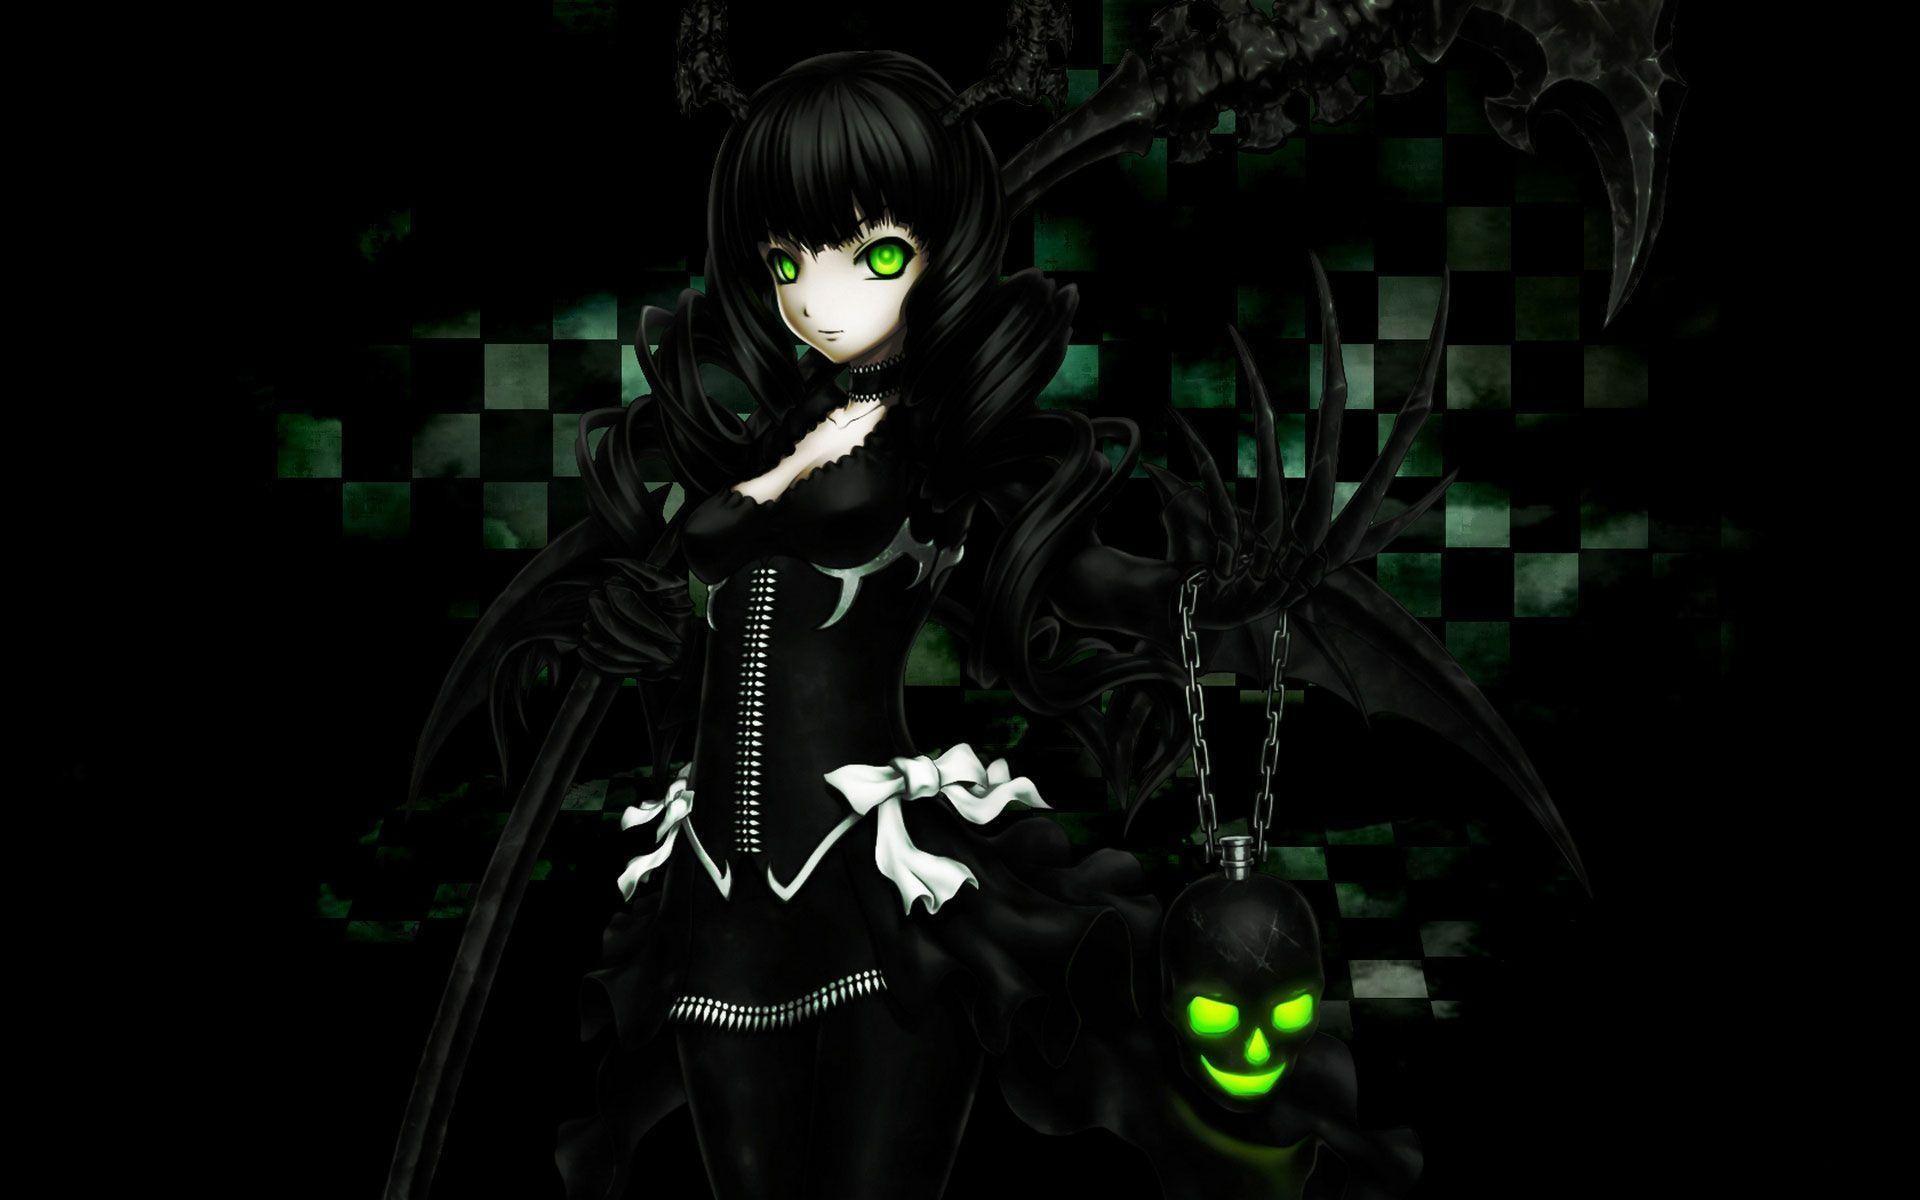 Res: 1920x1200, Dark Anime Desktop Wallpaper HD Resolution - dlwallhd.